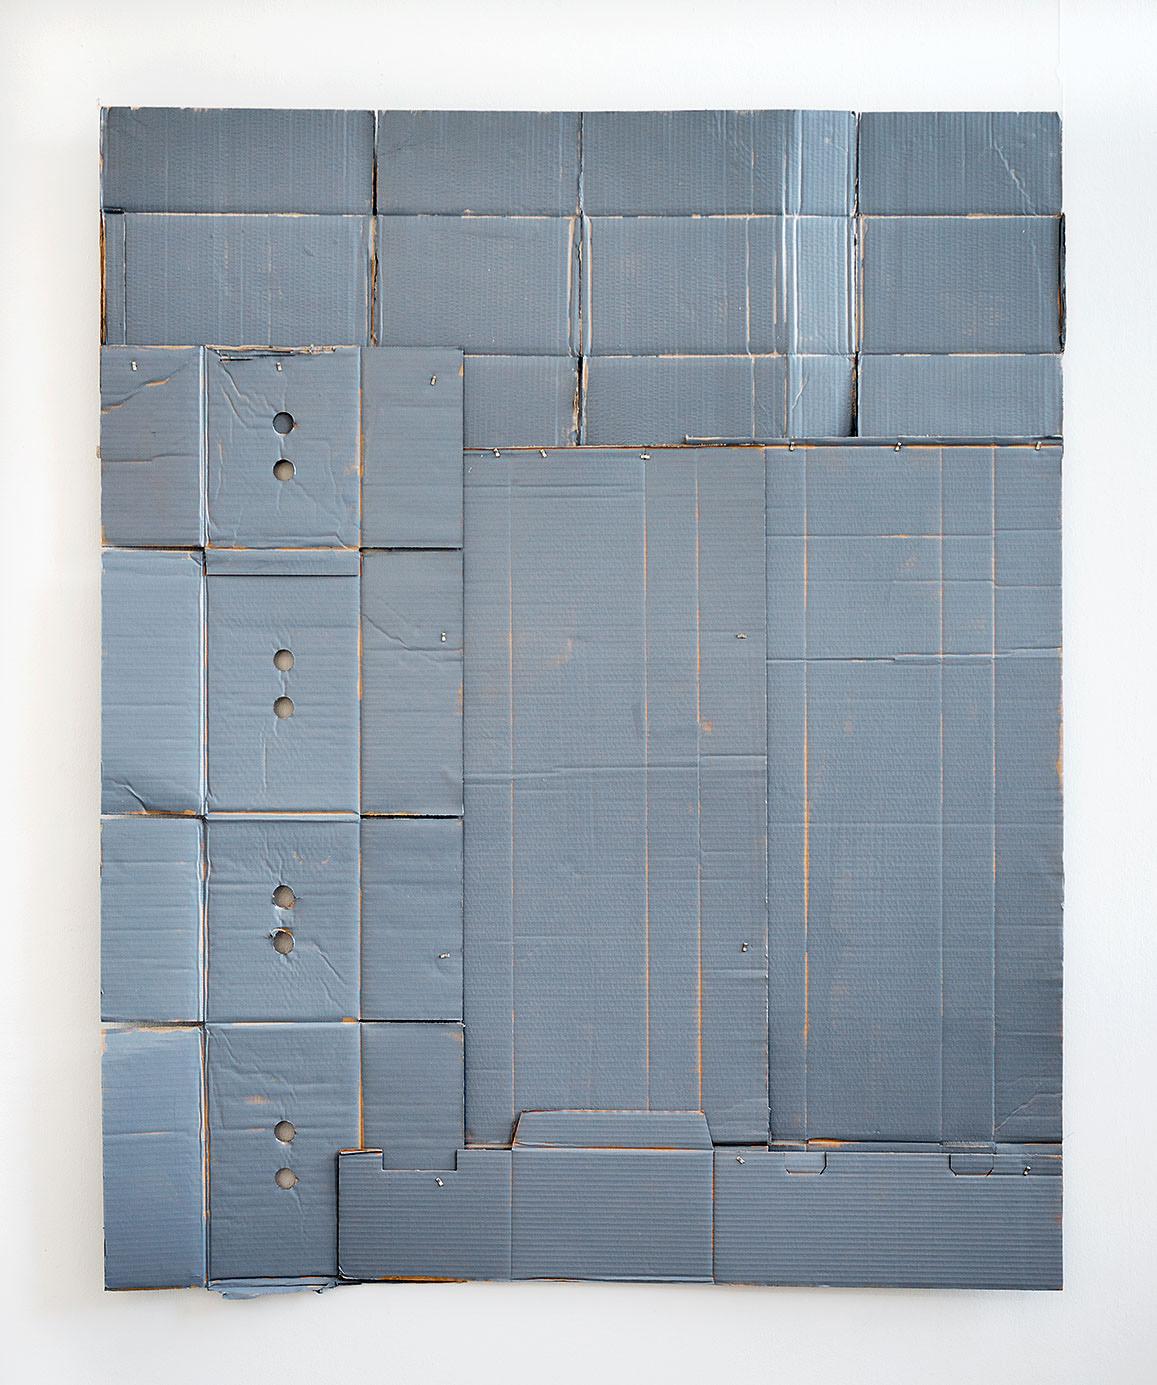 o.T., 2015; 165 x 135 cm